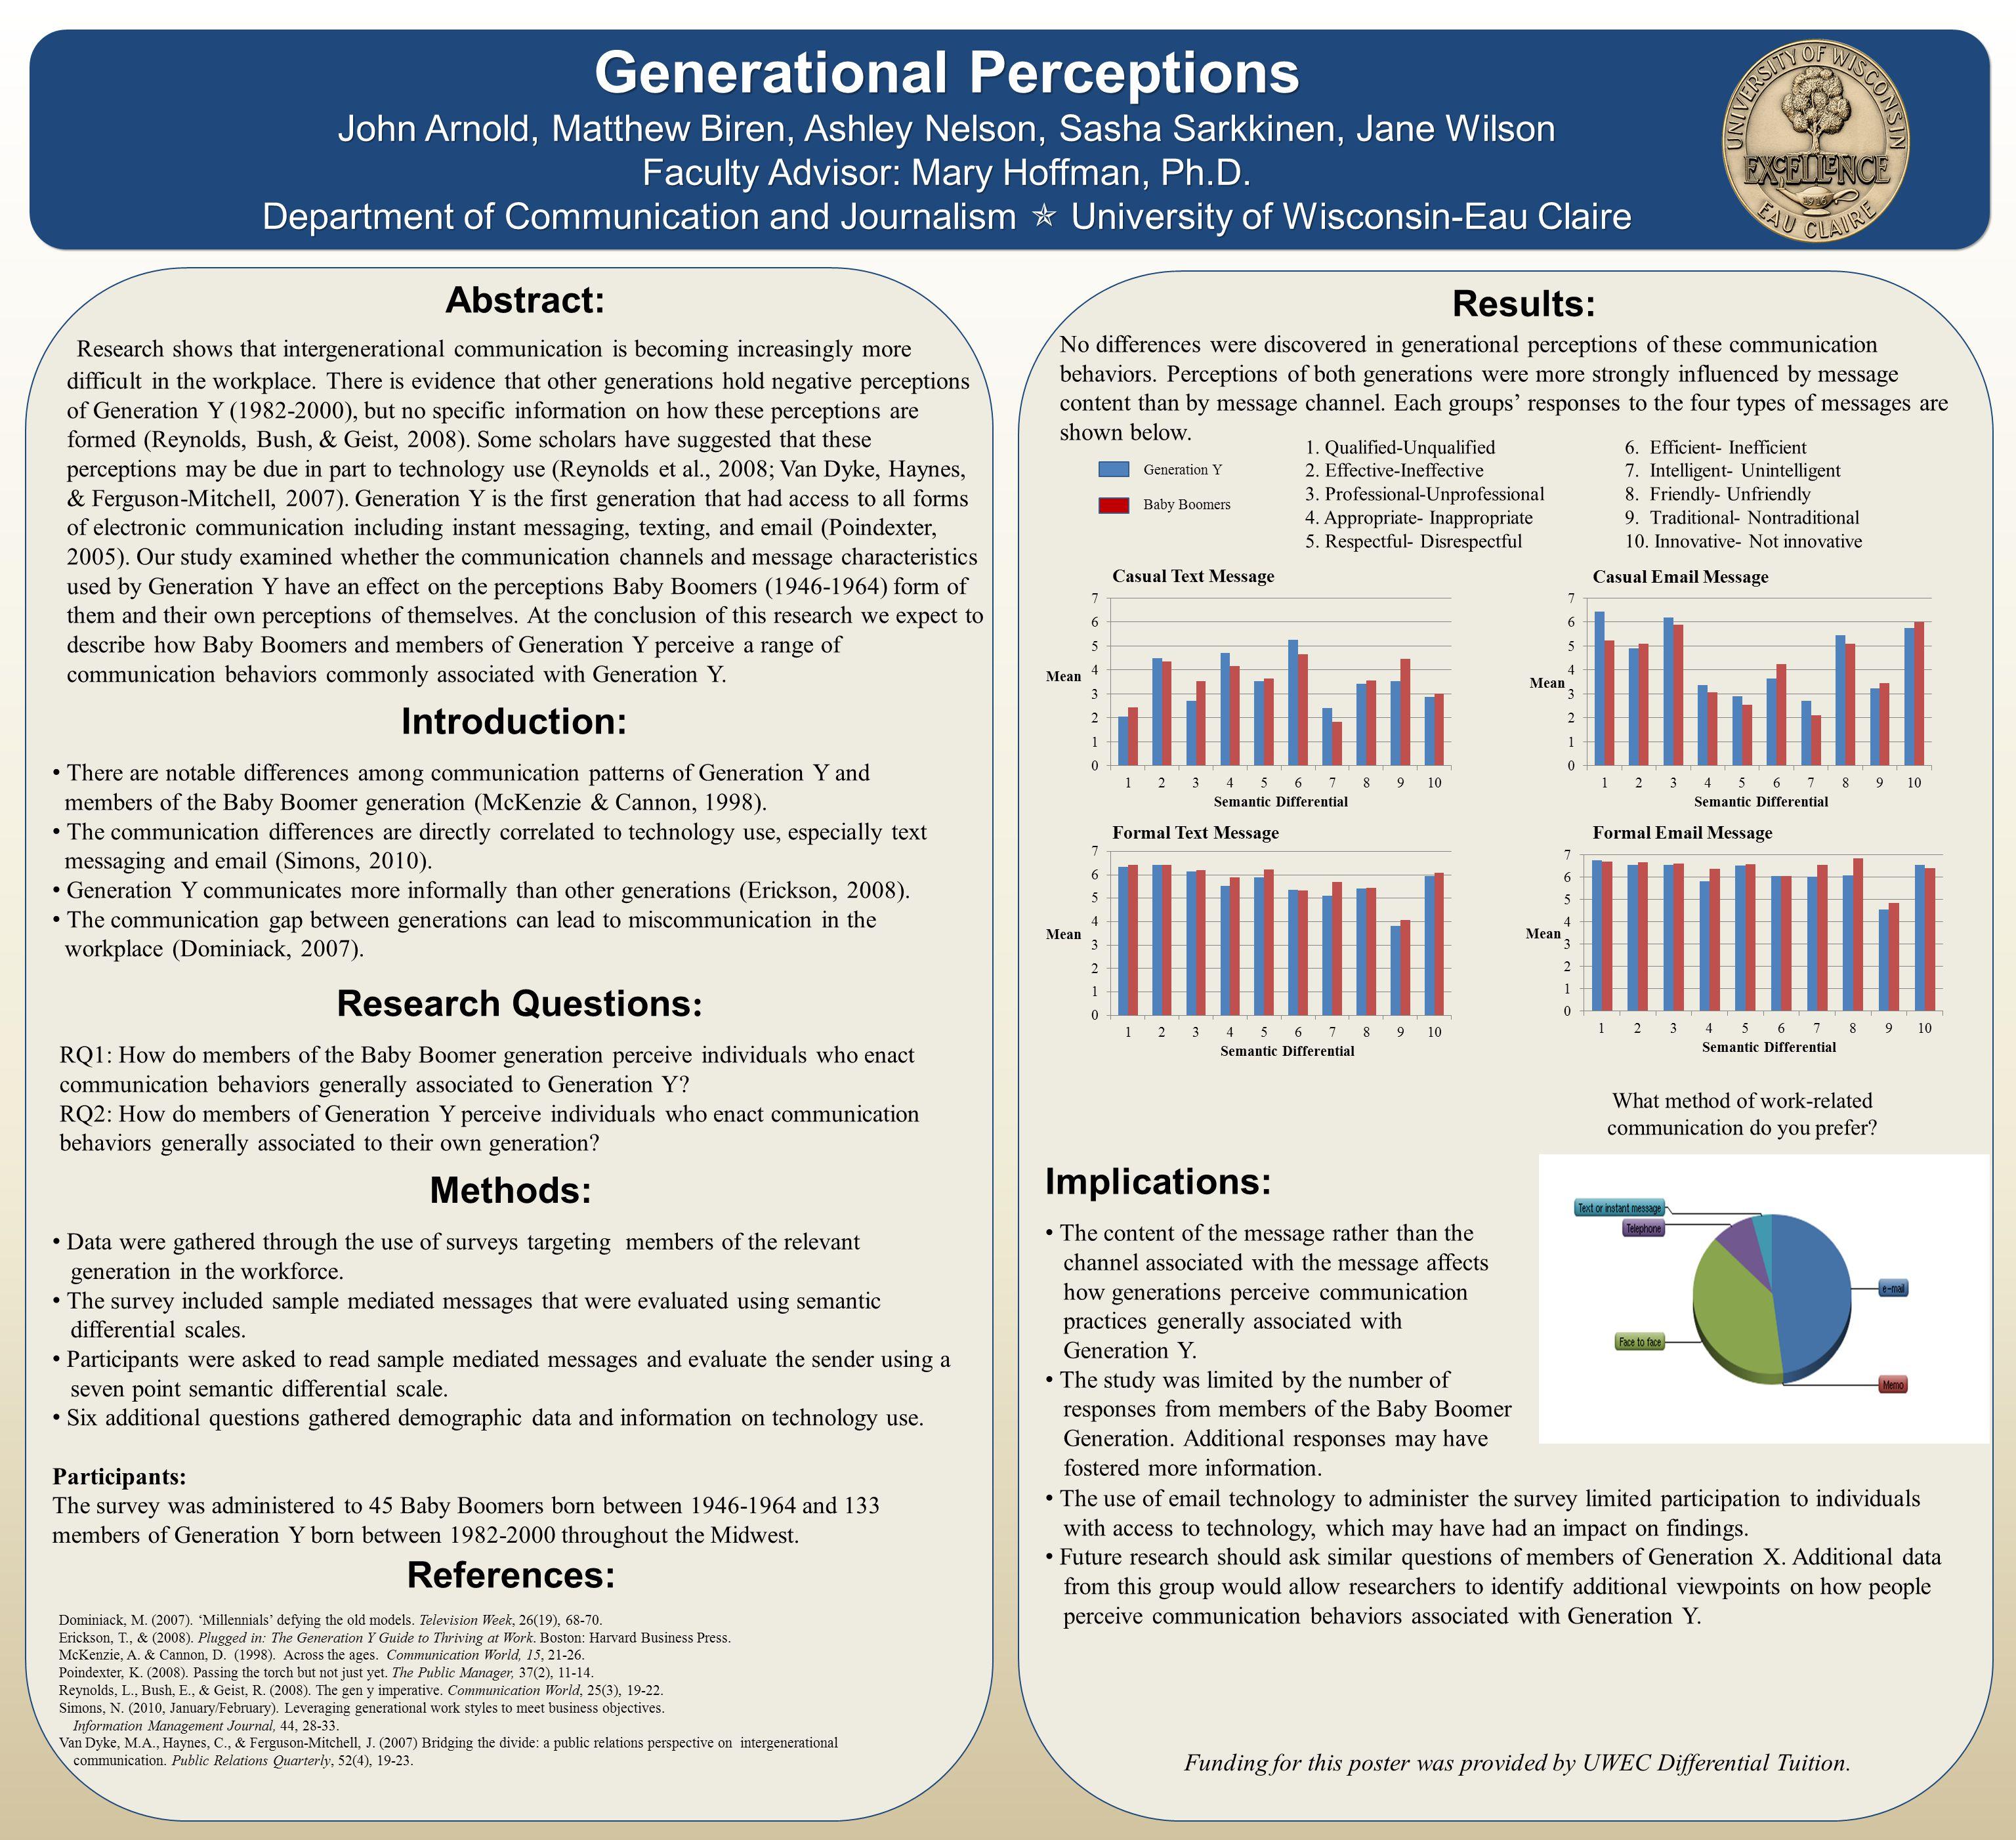 Generational Perceptions John Arnold, Matthew Biren, Ashley Nelson, Sasha Sarkkinen, Jane Wilson Faculty Advisor: Mary Hoffman, Ph.D.